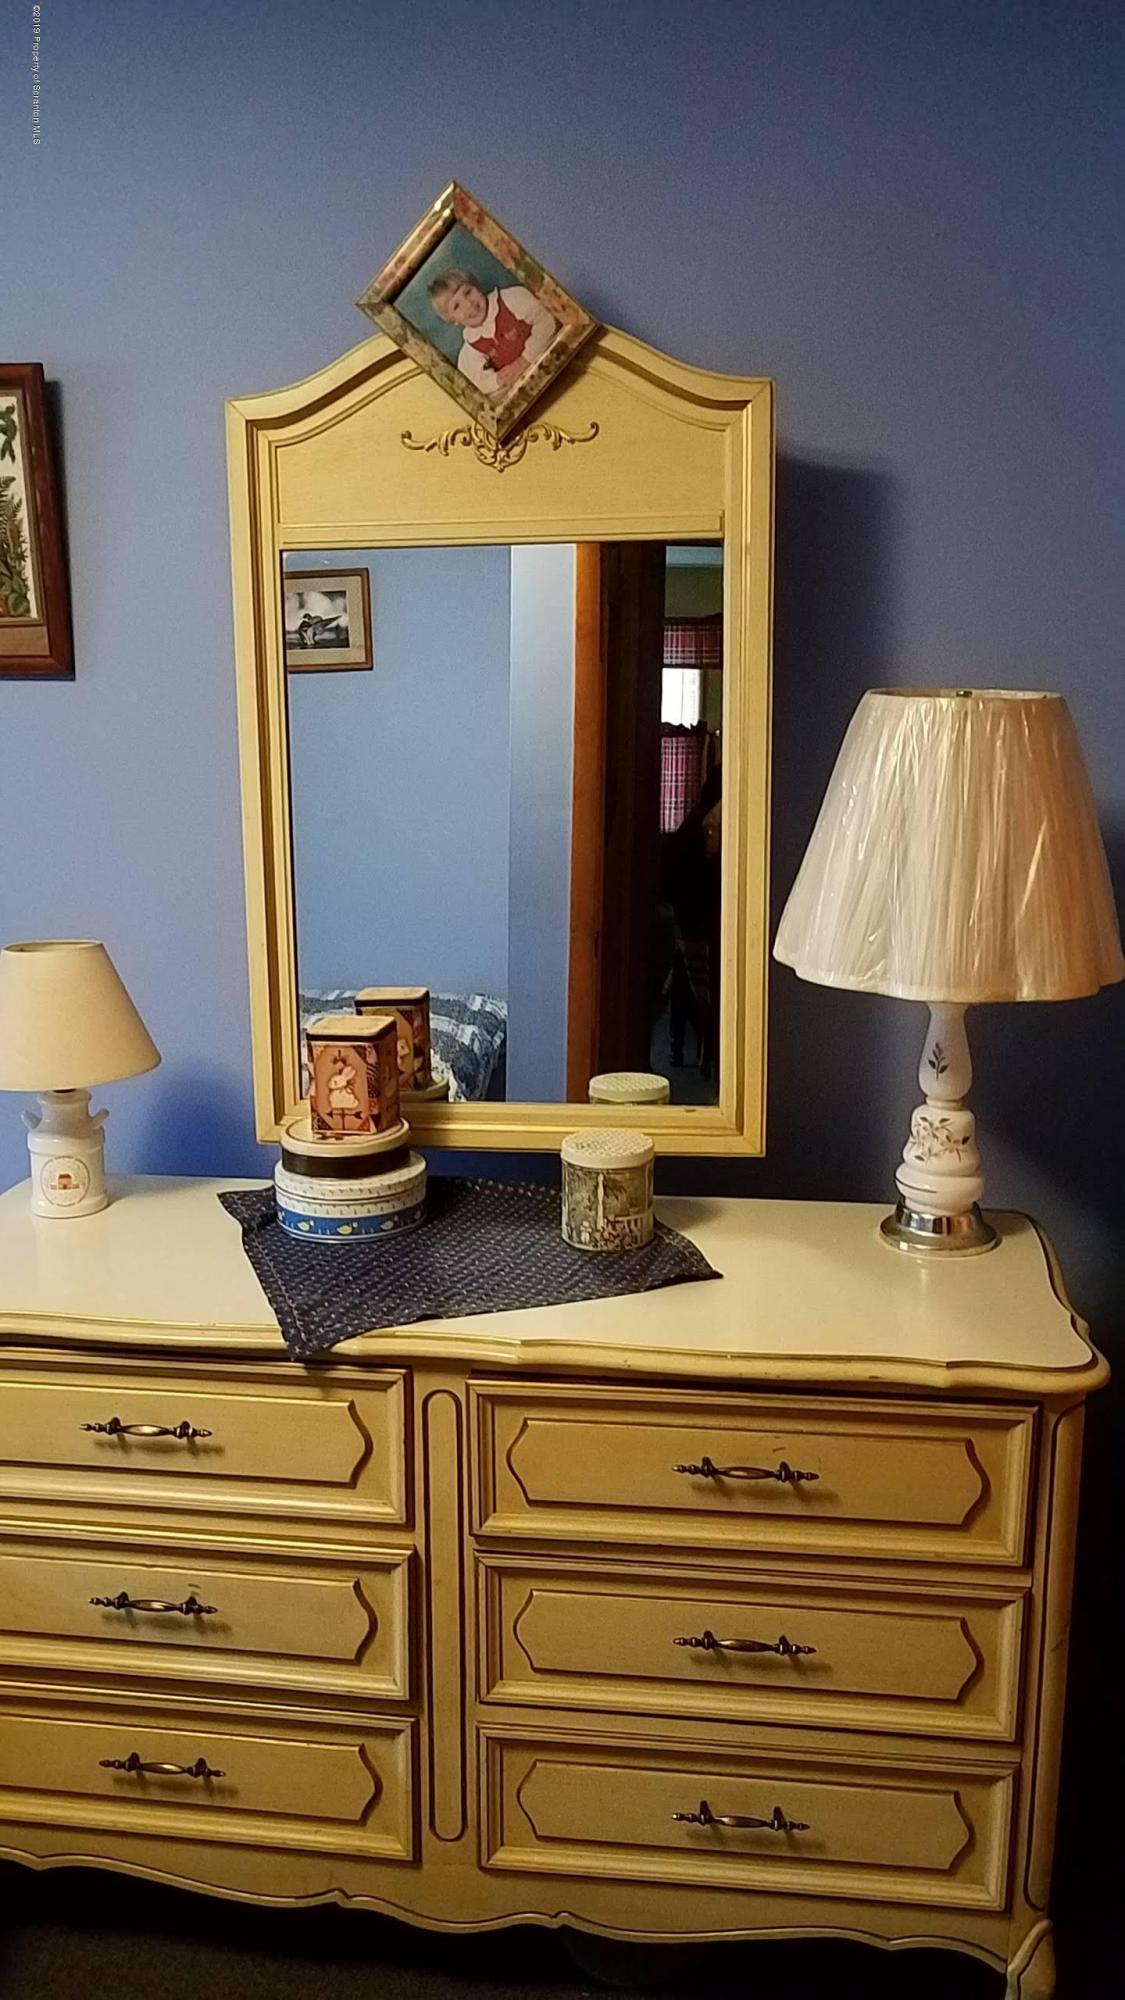 643 East Shore Drive, Susquehanna, Pennsylvania 18847, 3 Bedrooms Bedrooms, 5 Rooms Rooms,2 BathroomsBathrooms,Single Family,For Sale,East Shore Drive,19-2142